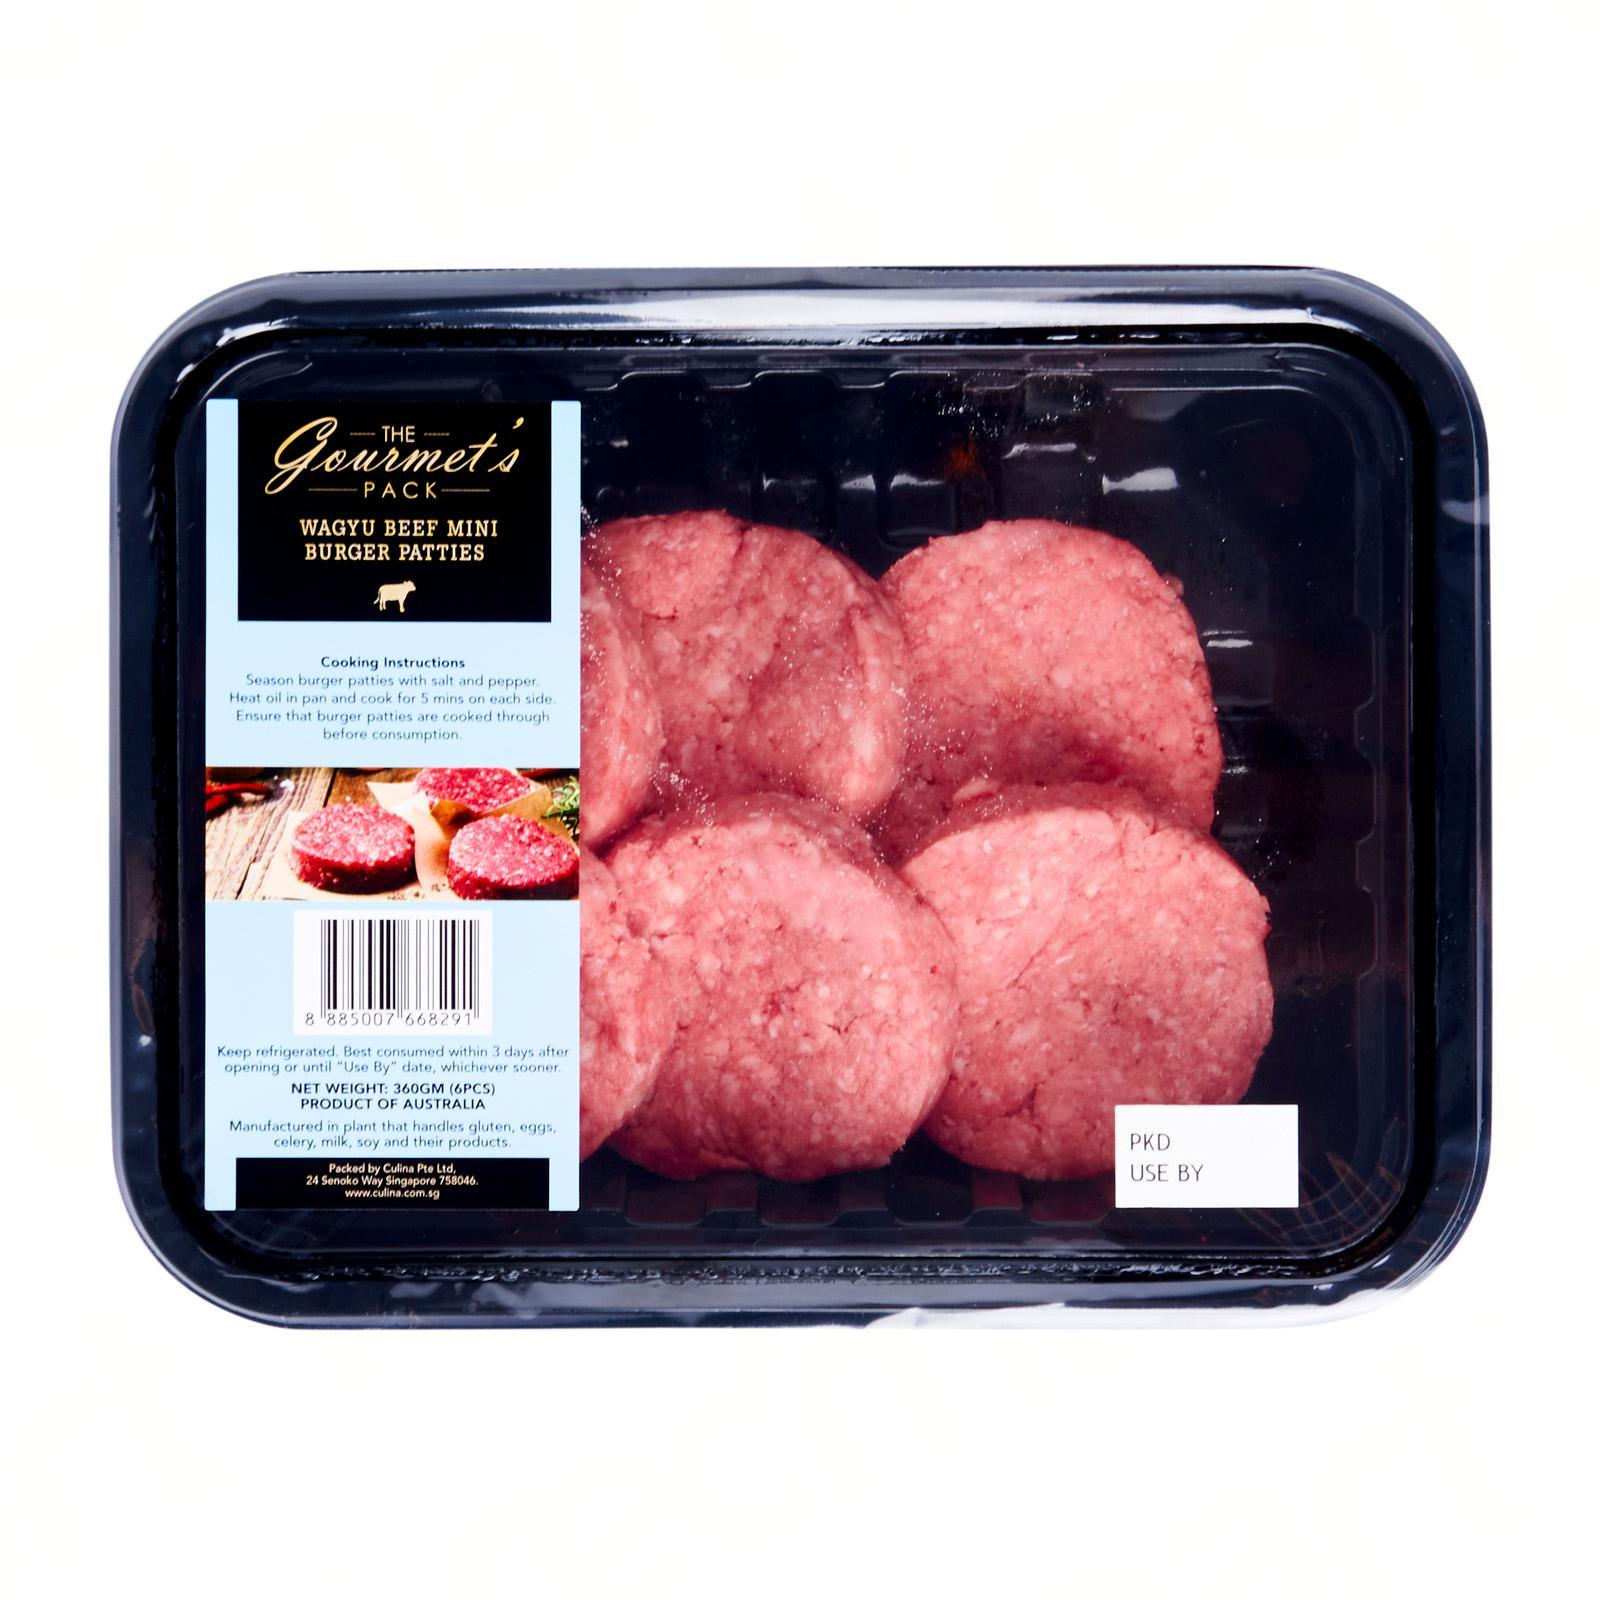 The Gourmet's Pack Wagyu Beef Mini Burger Patties - Australia